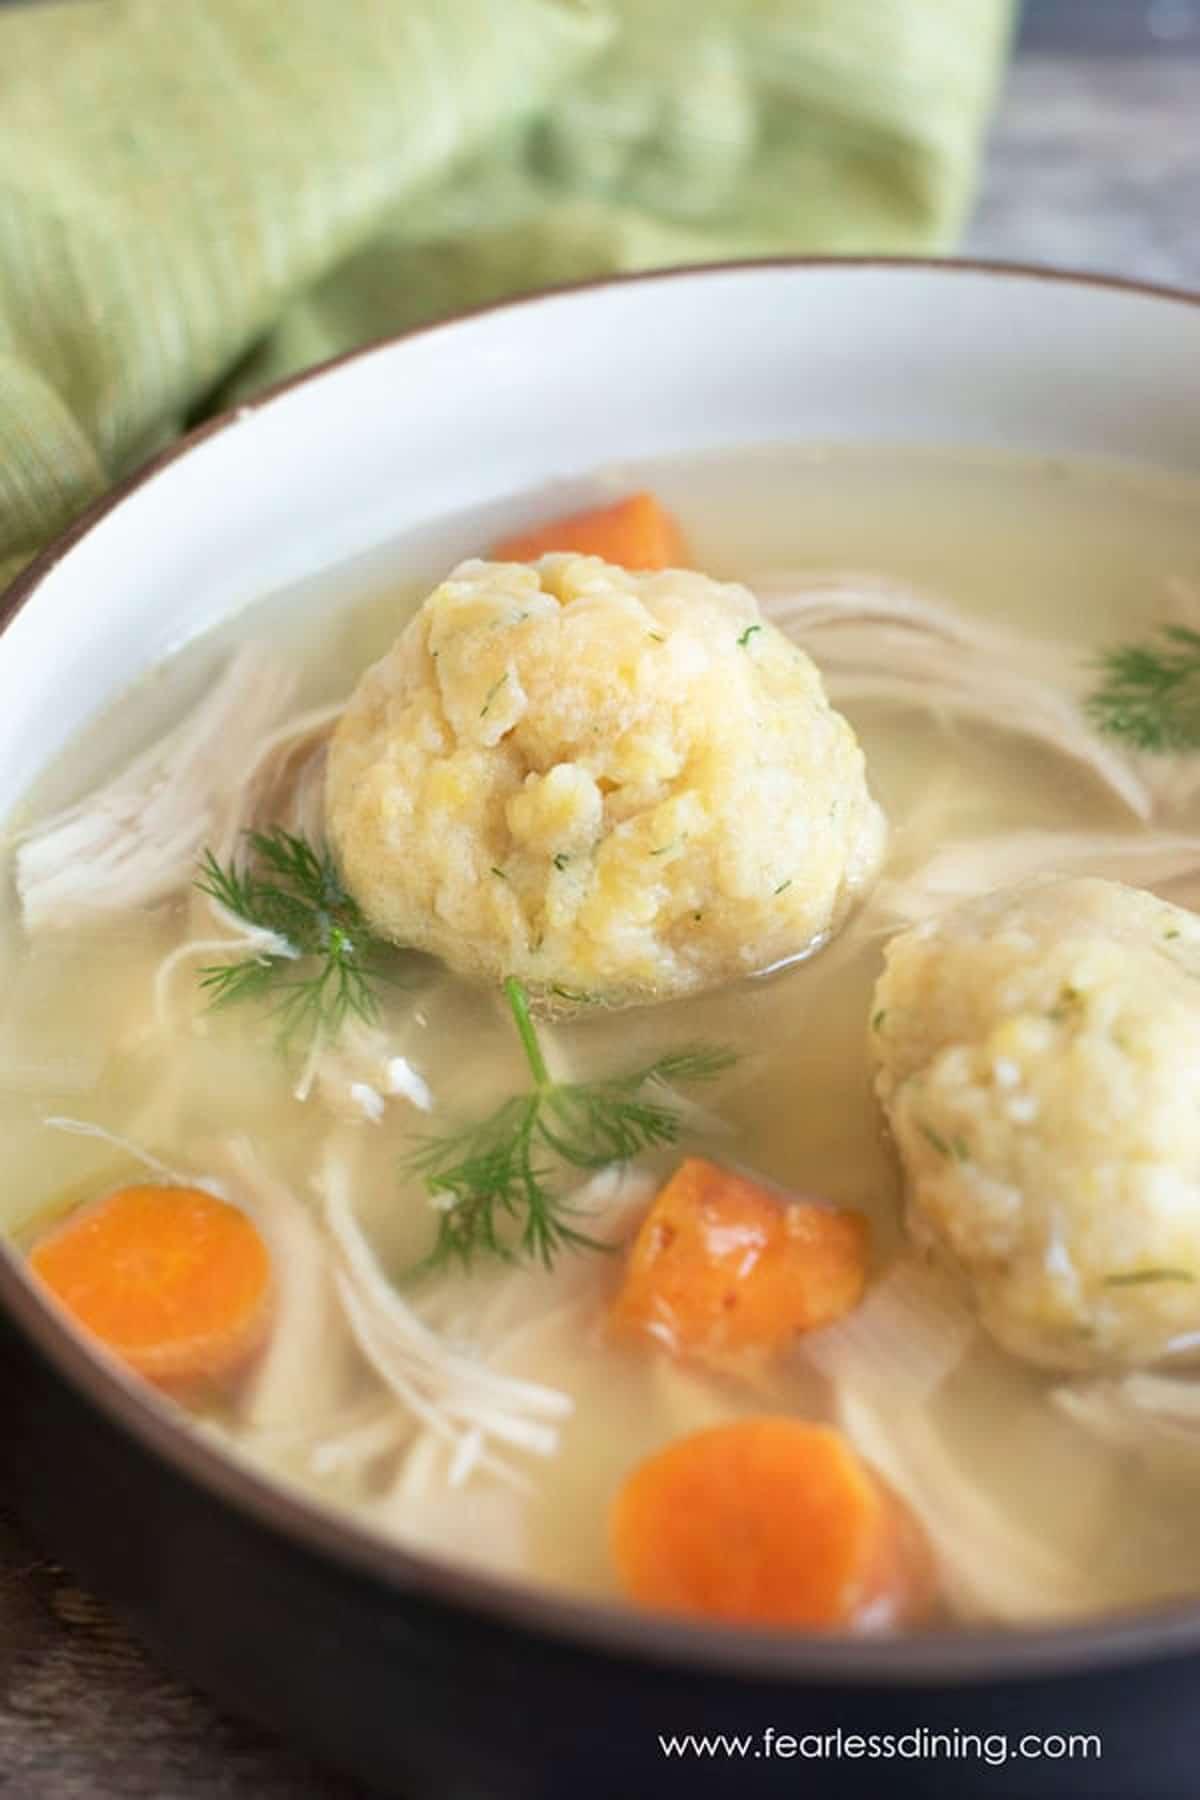 close up of a bowl of matzo ball soup